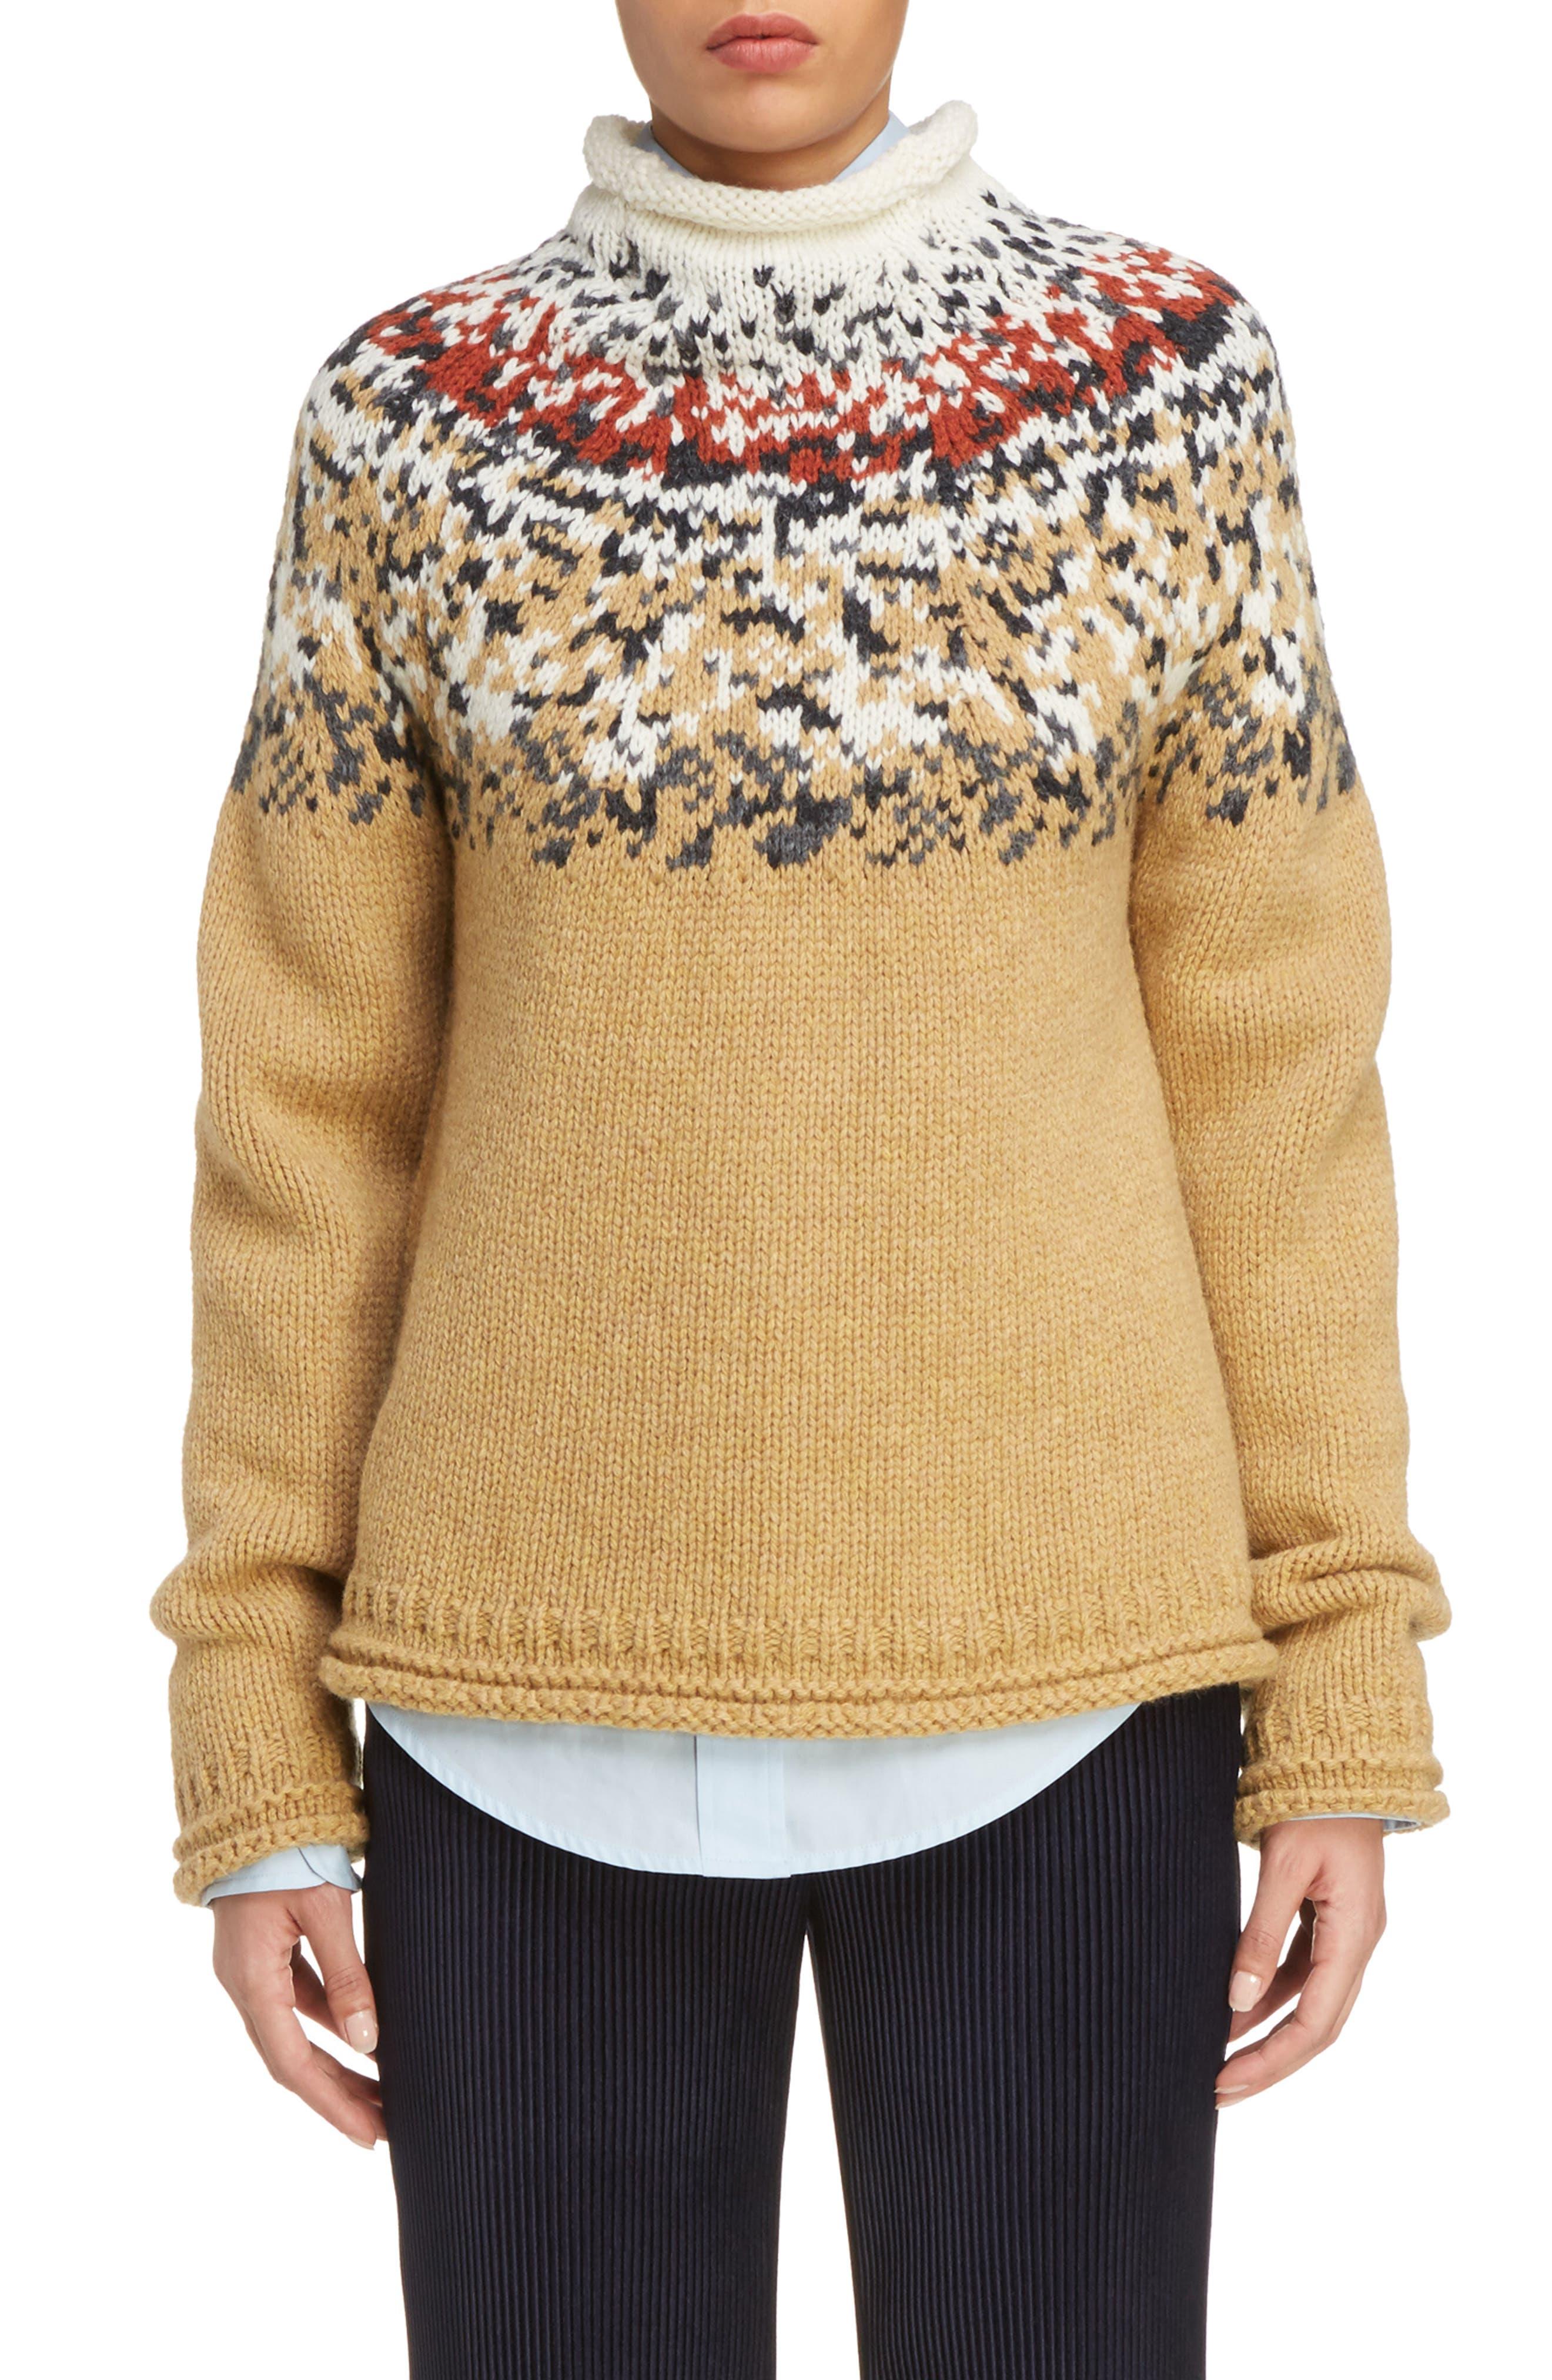 Sirius Heavy Icelandic High Neck Sweater,                         Main,                         color, 250